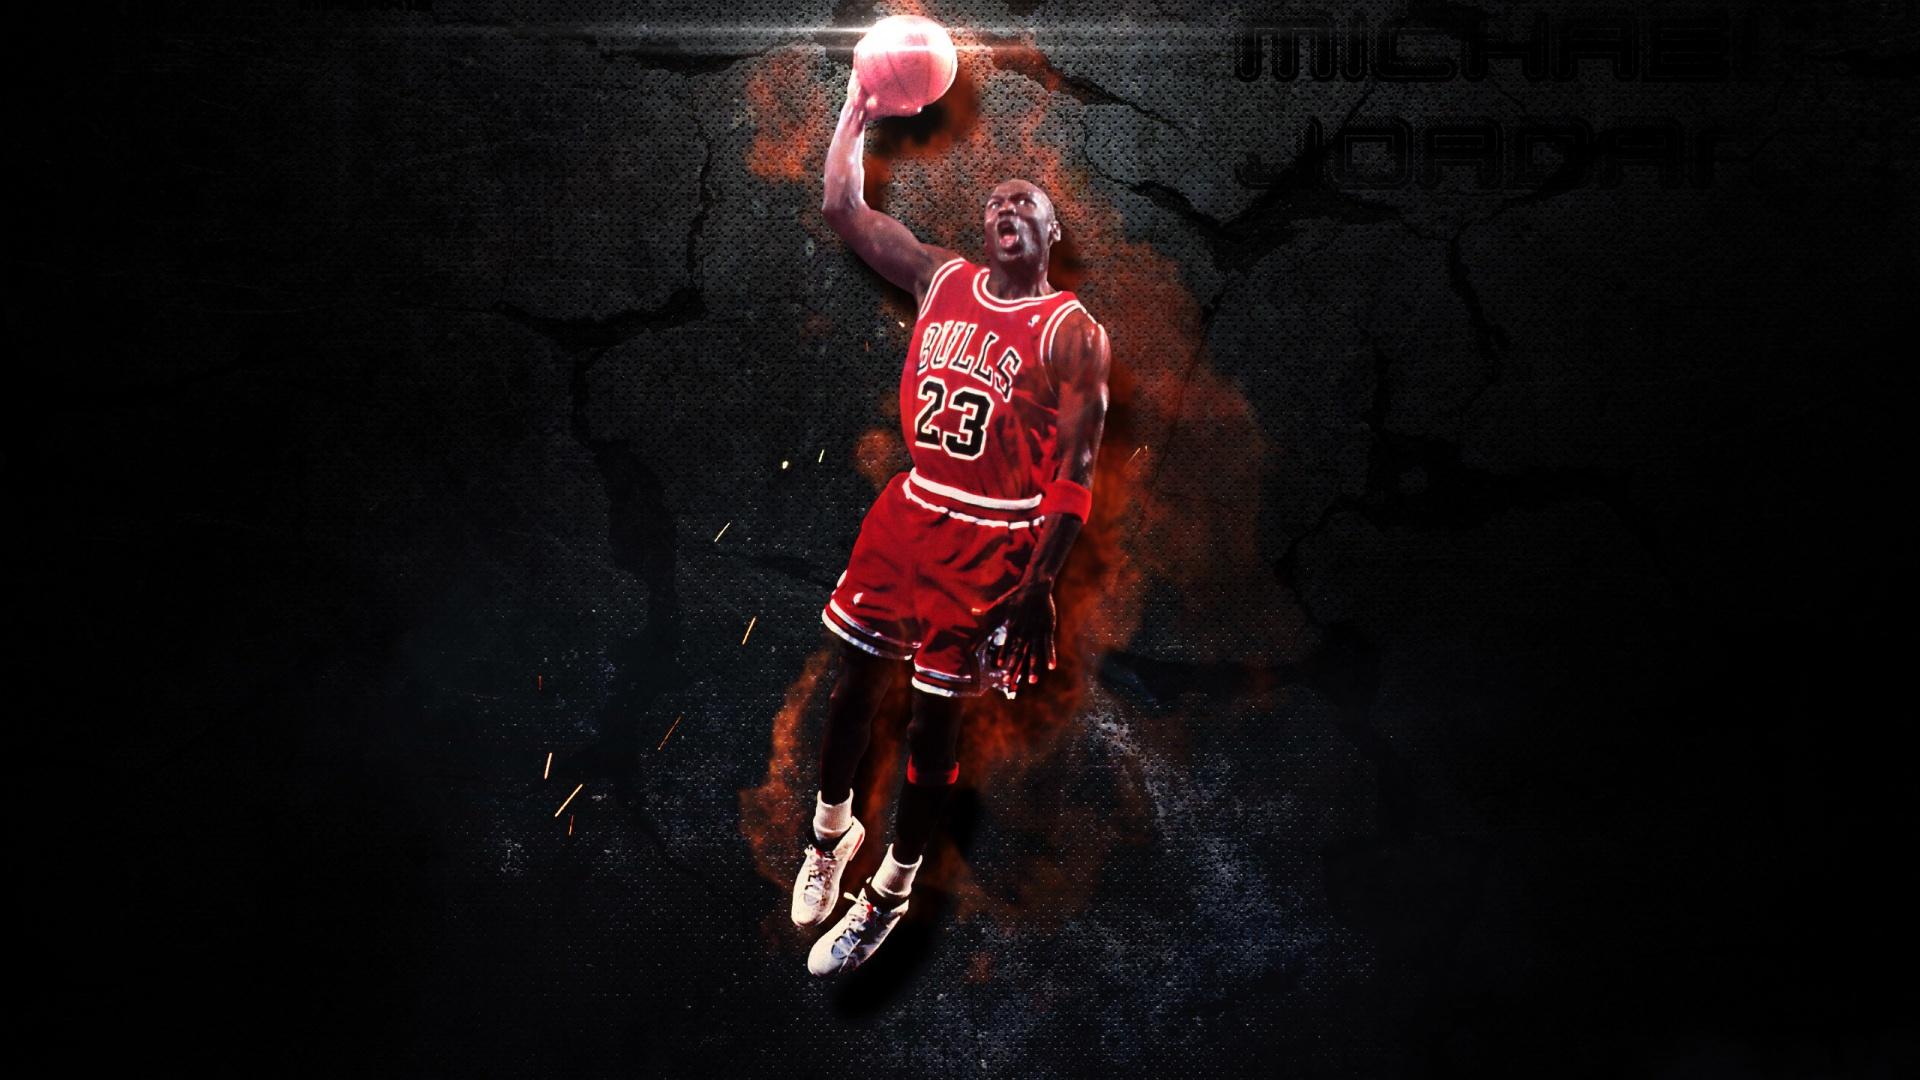 Michael Jordan cool background